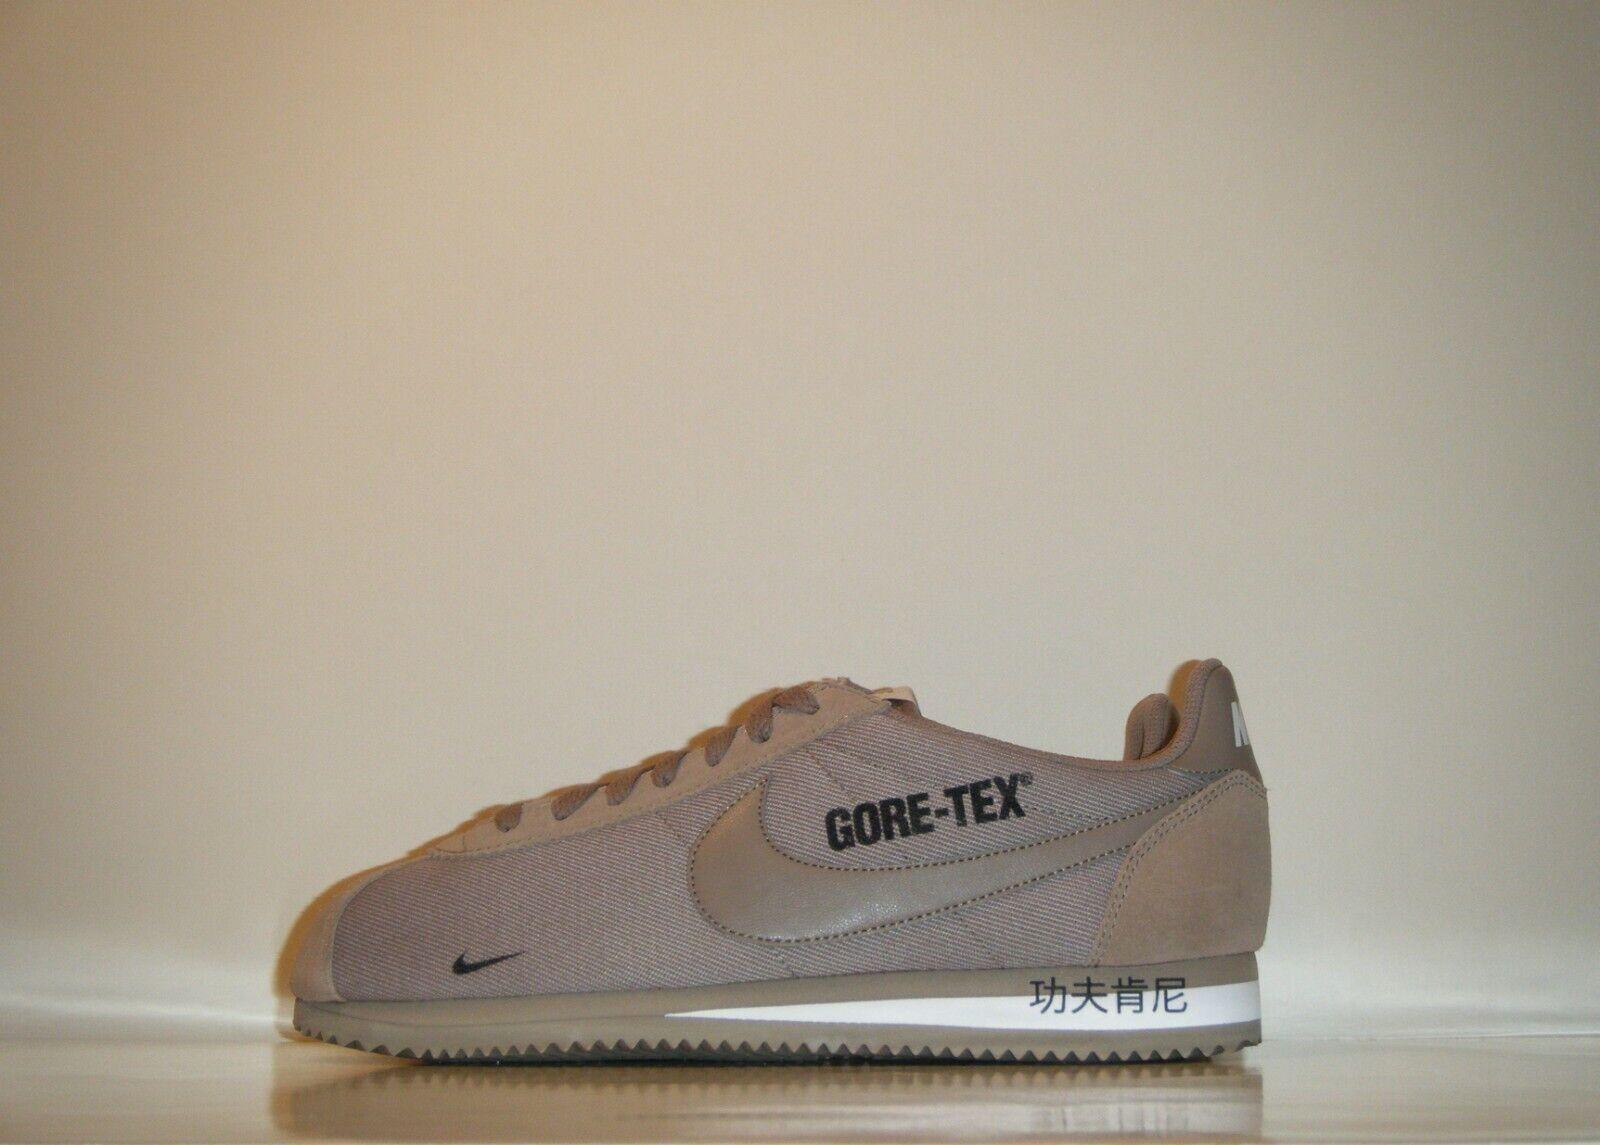 2018 Nike Classic Cortez 15 GORE-TEX marron PROMO Sample sz. 9 Kenny blanc cassé